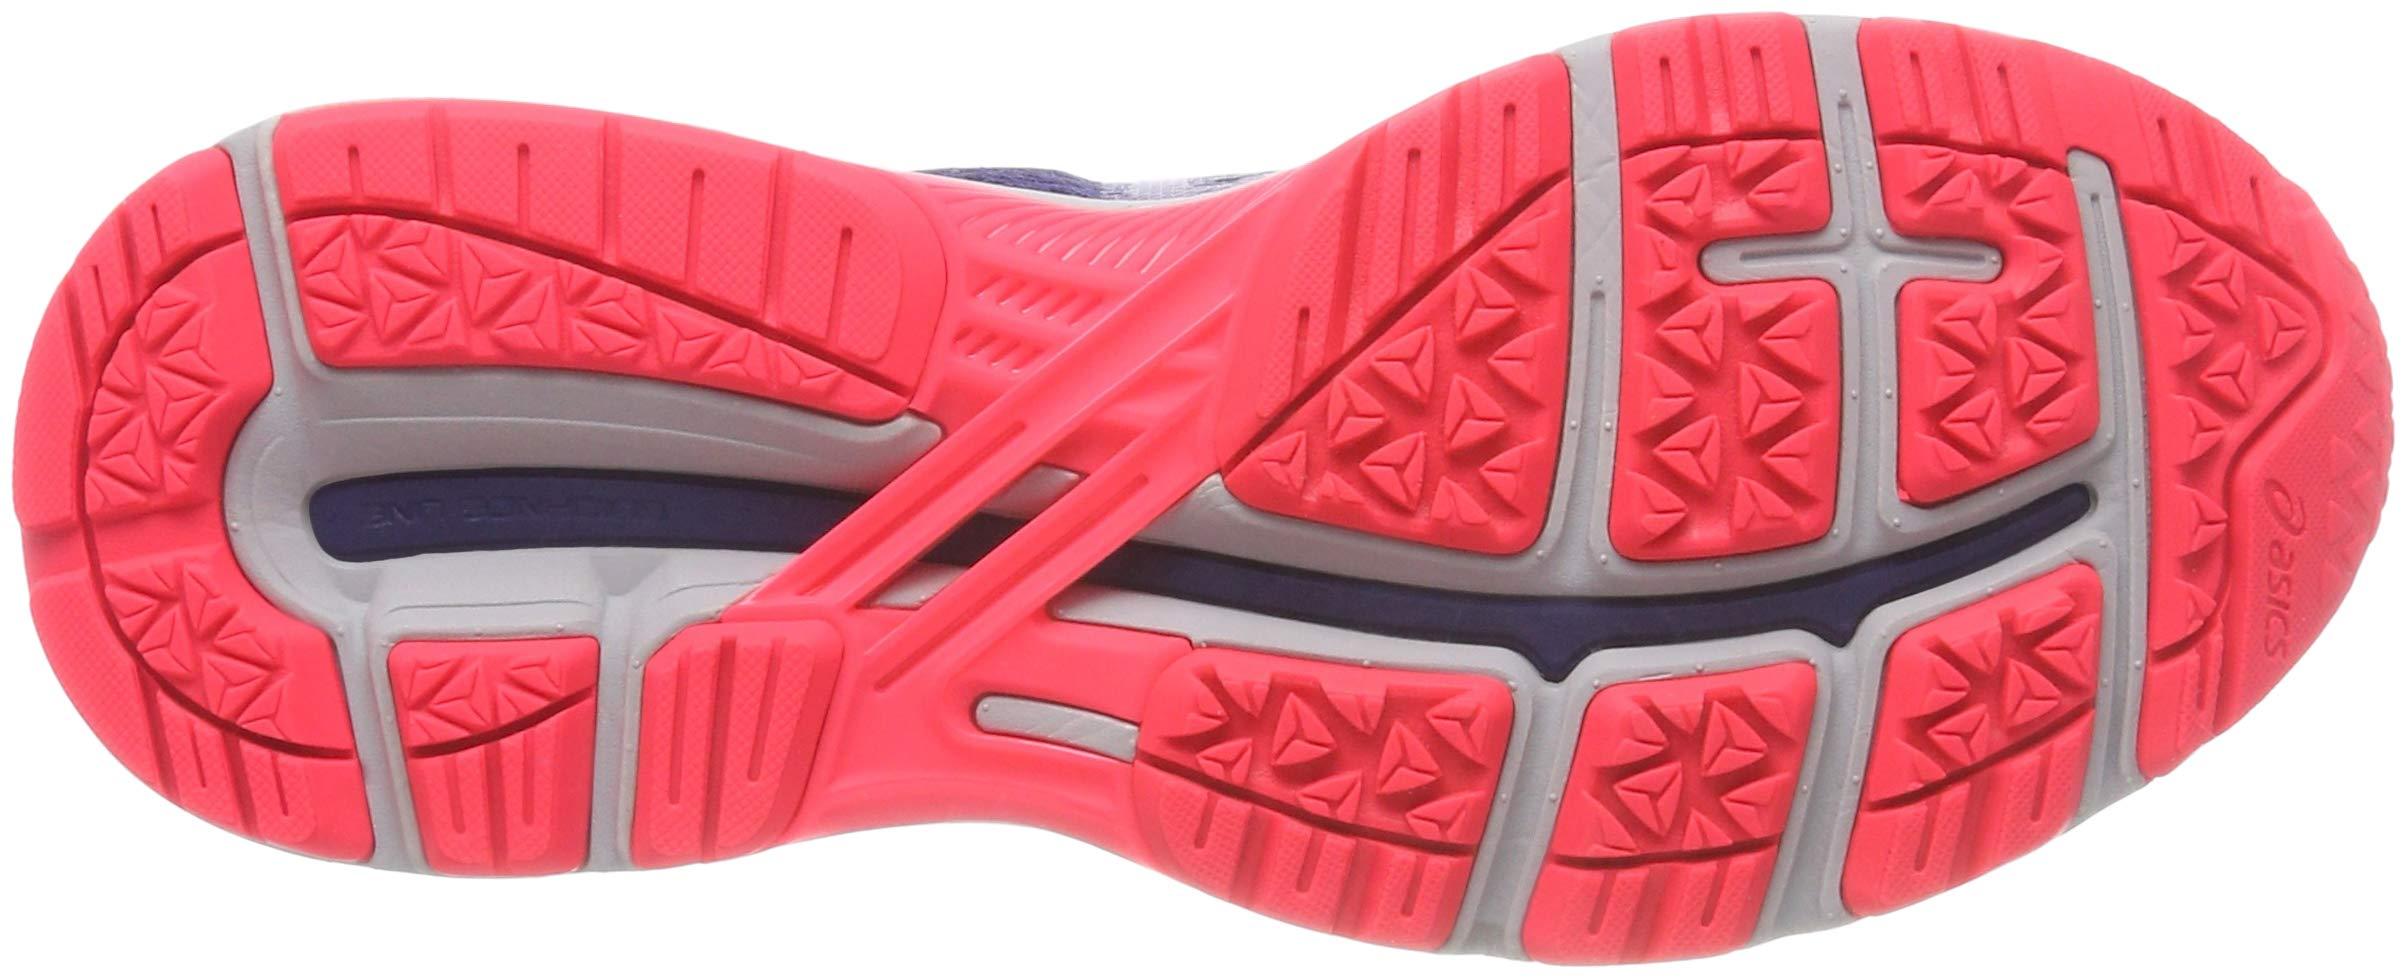 717Zgq7IK%2BL - ASICS Women's Gt-2000 6 Trail Plasmaguard Running Shoes, 11.5 UK